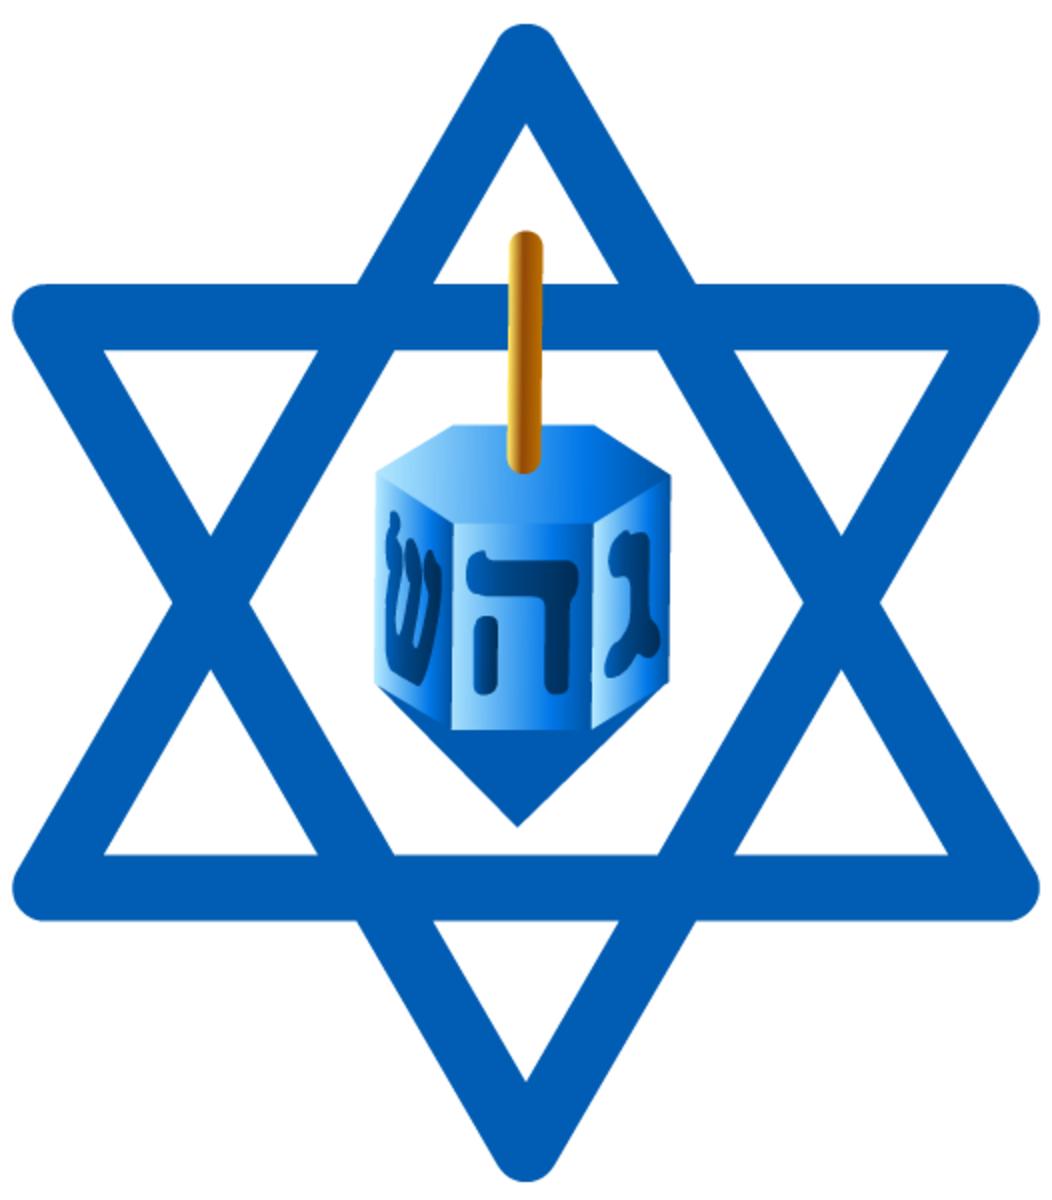 Hanukkah symbols: dreidel and star of David